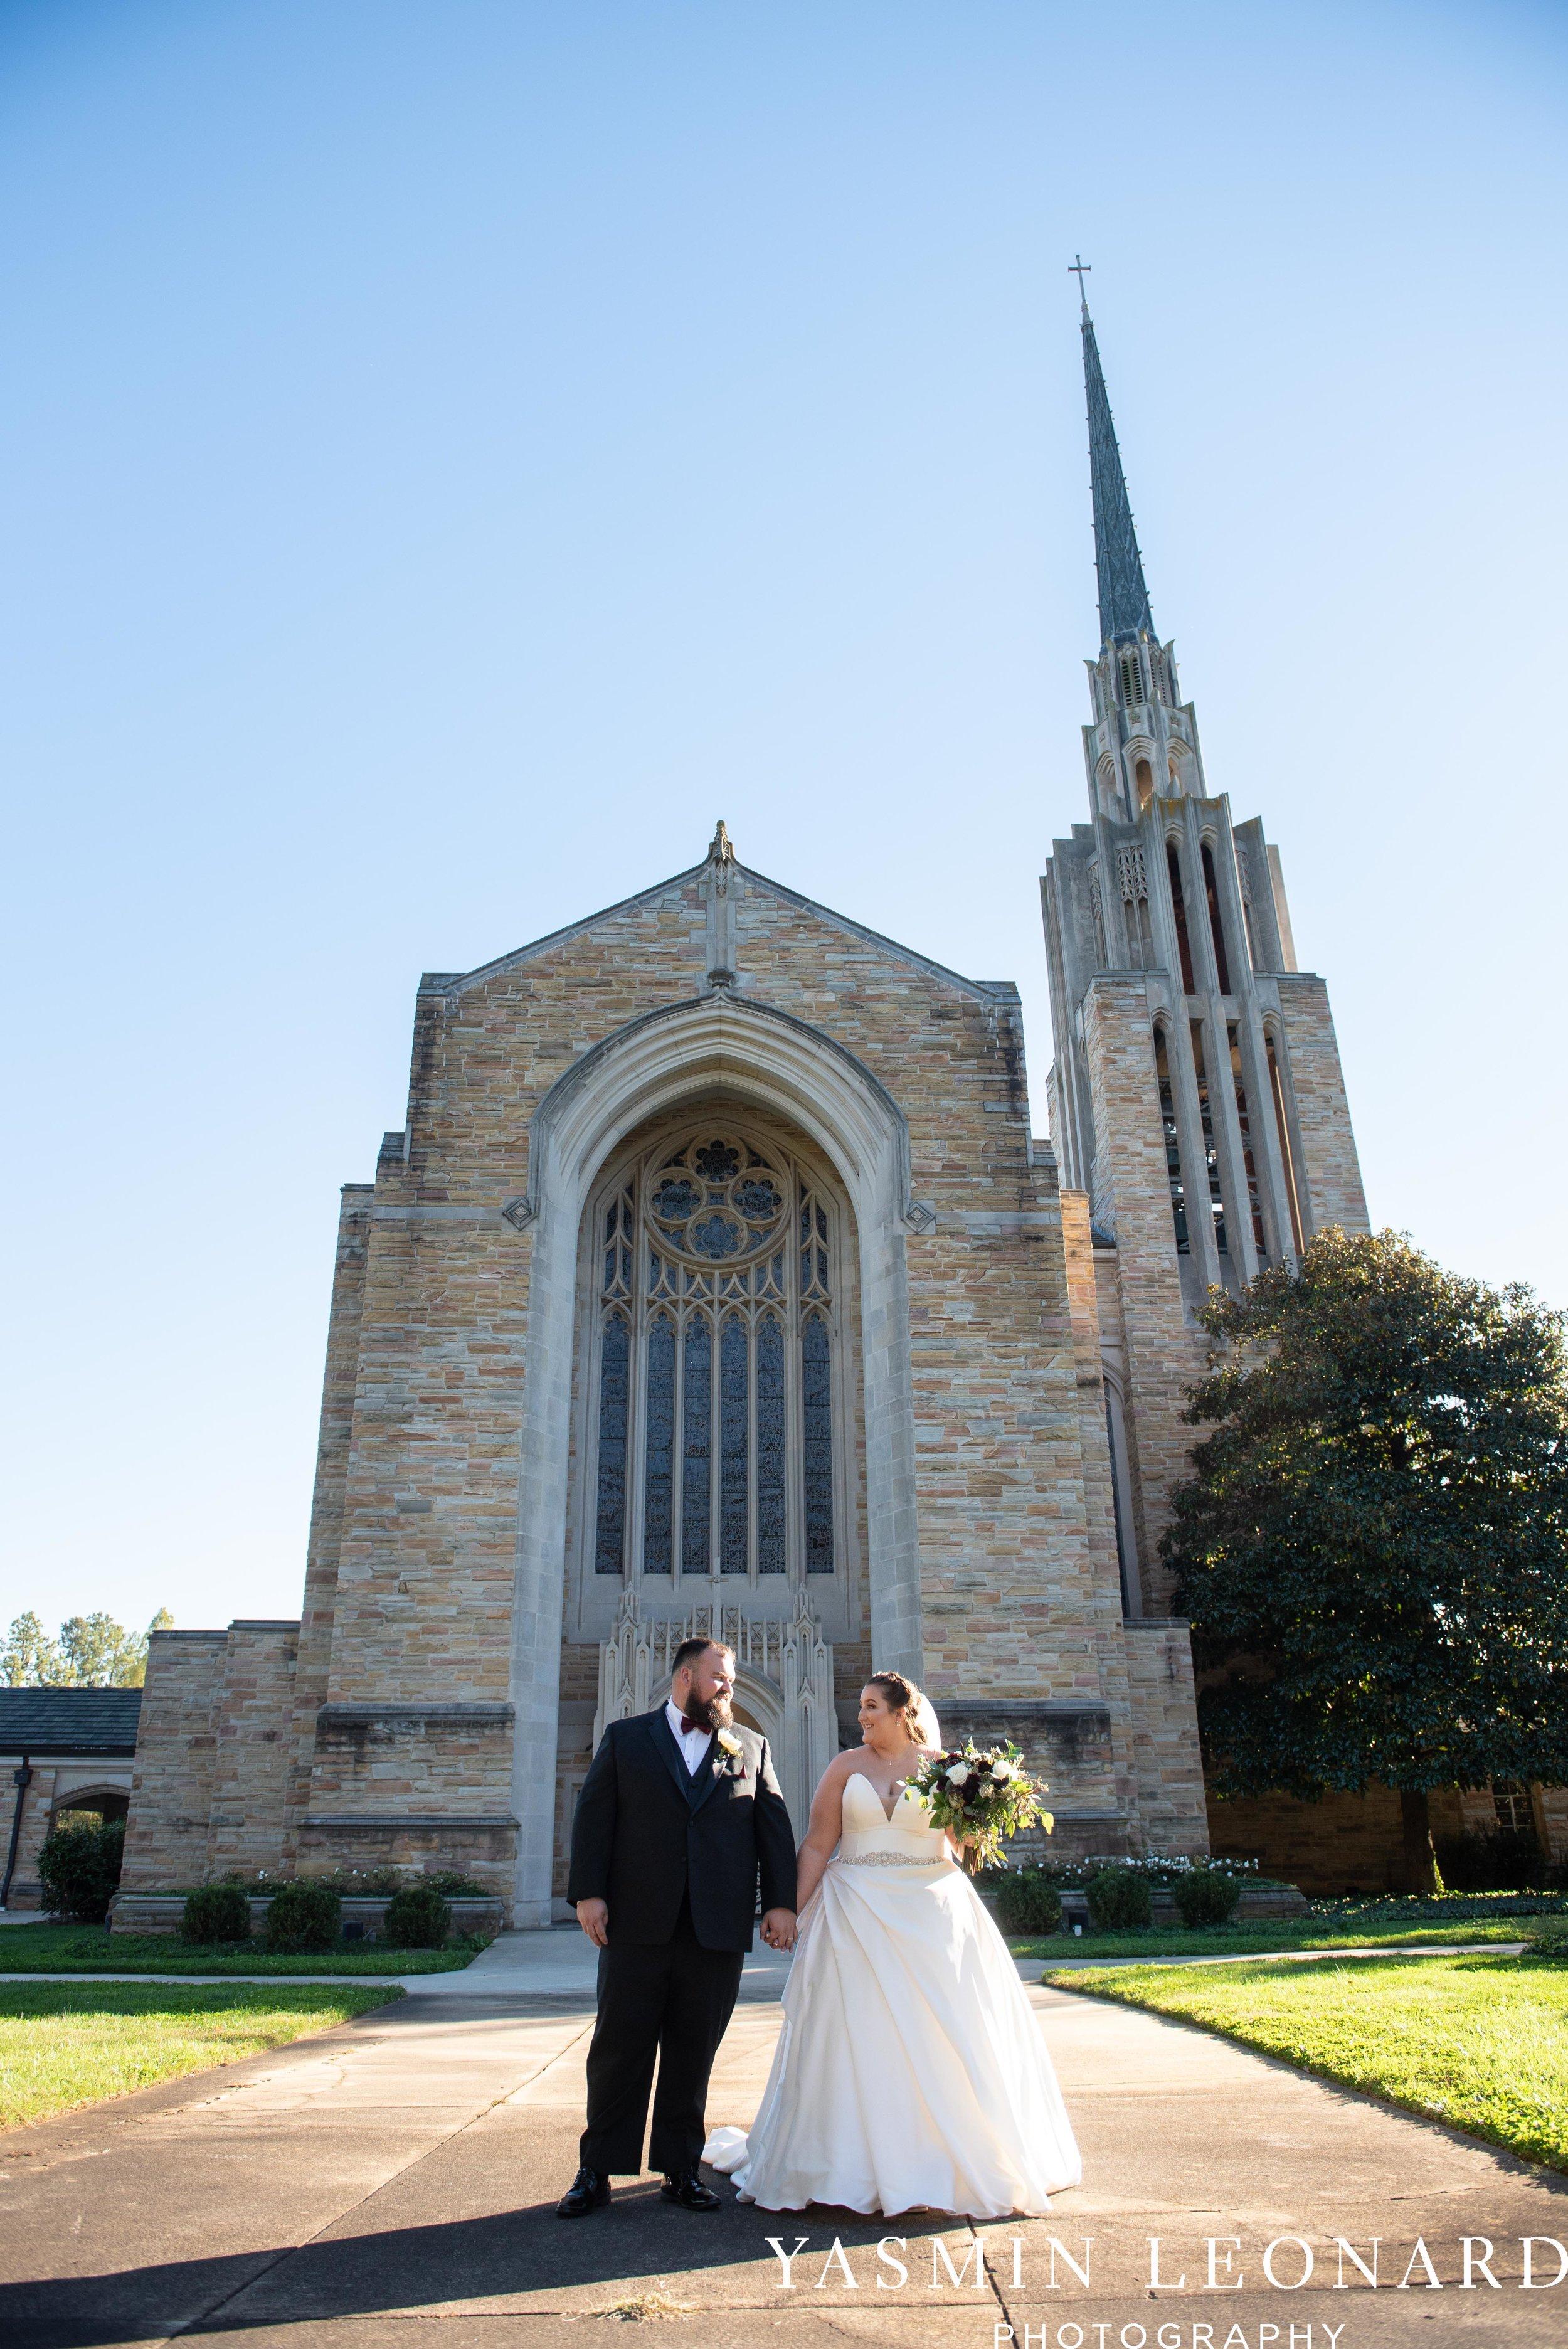 Wesley Memorial United Methodist Church - Old Homeplace Winery - High Point Weddings - High Point Wedding Photographer - NC Weddings - NC Barn Venue - Yasmin Leonard Photography-31.jpg